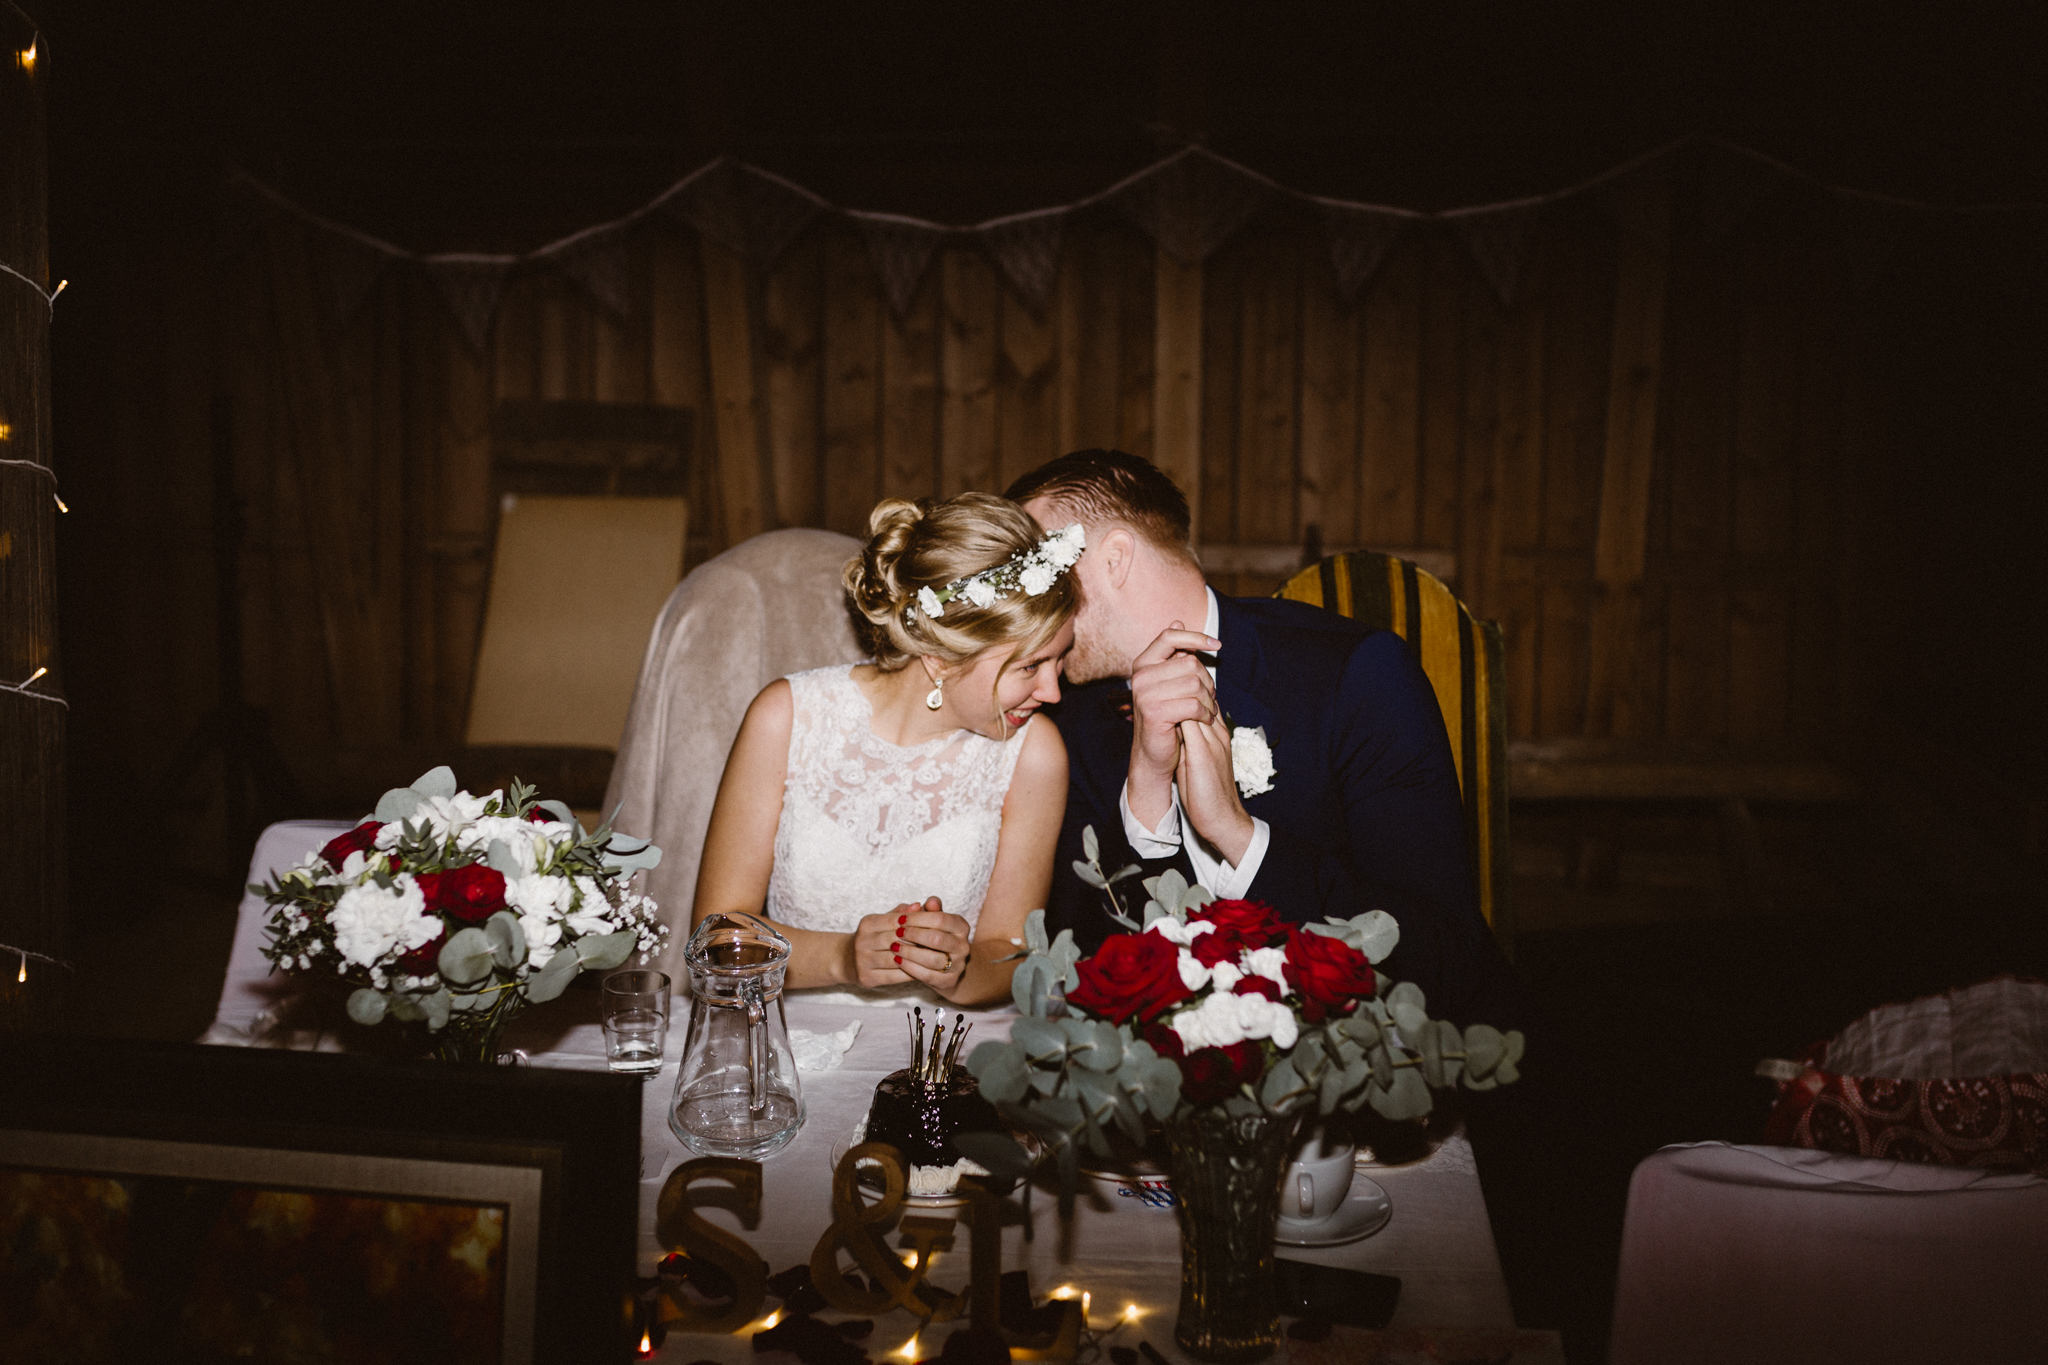 Leevi + Susanna -- Patrick Karkkolainen Wedding Photographer-476.jpg